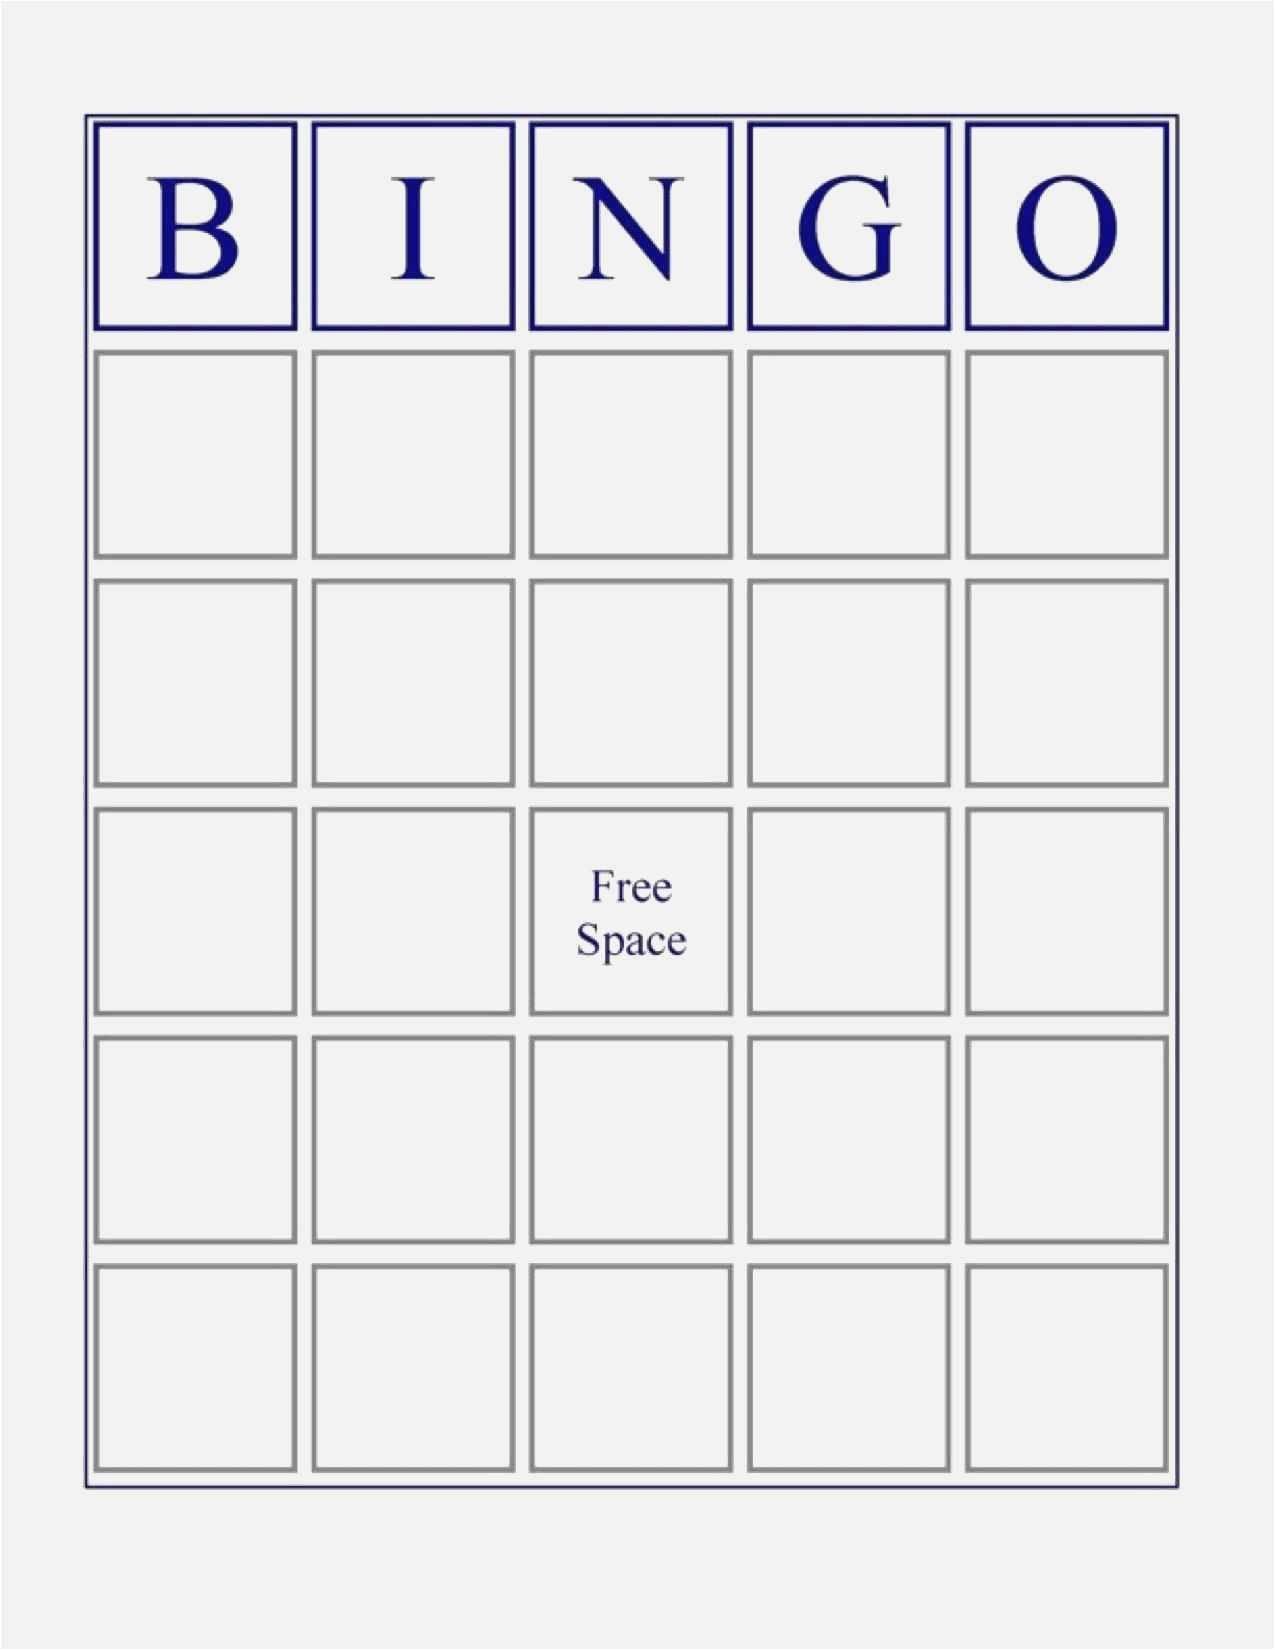 Free Collection Blank Bingo Card Template Microsoft Word Blank Bingo With Bingo Card Template Word